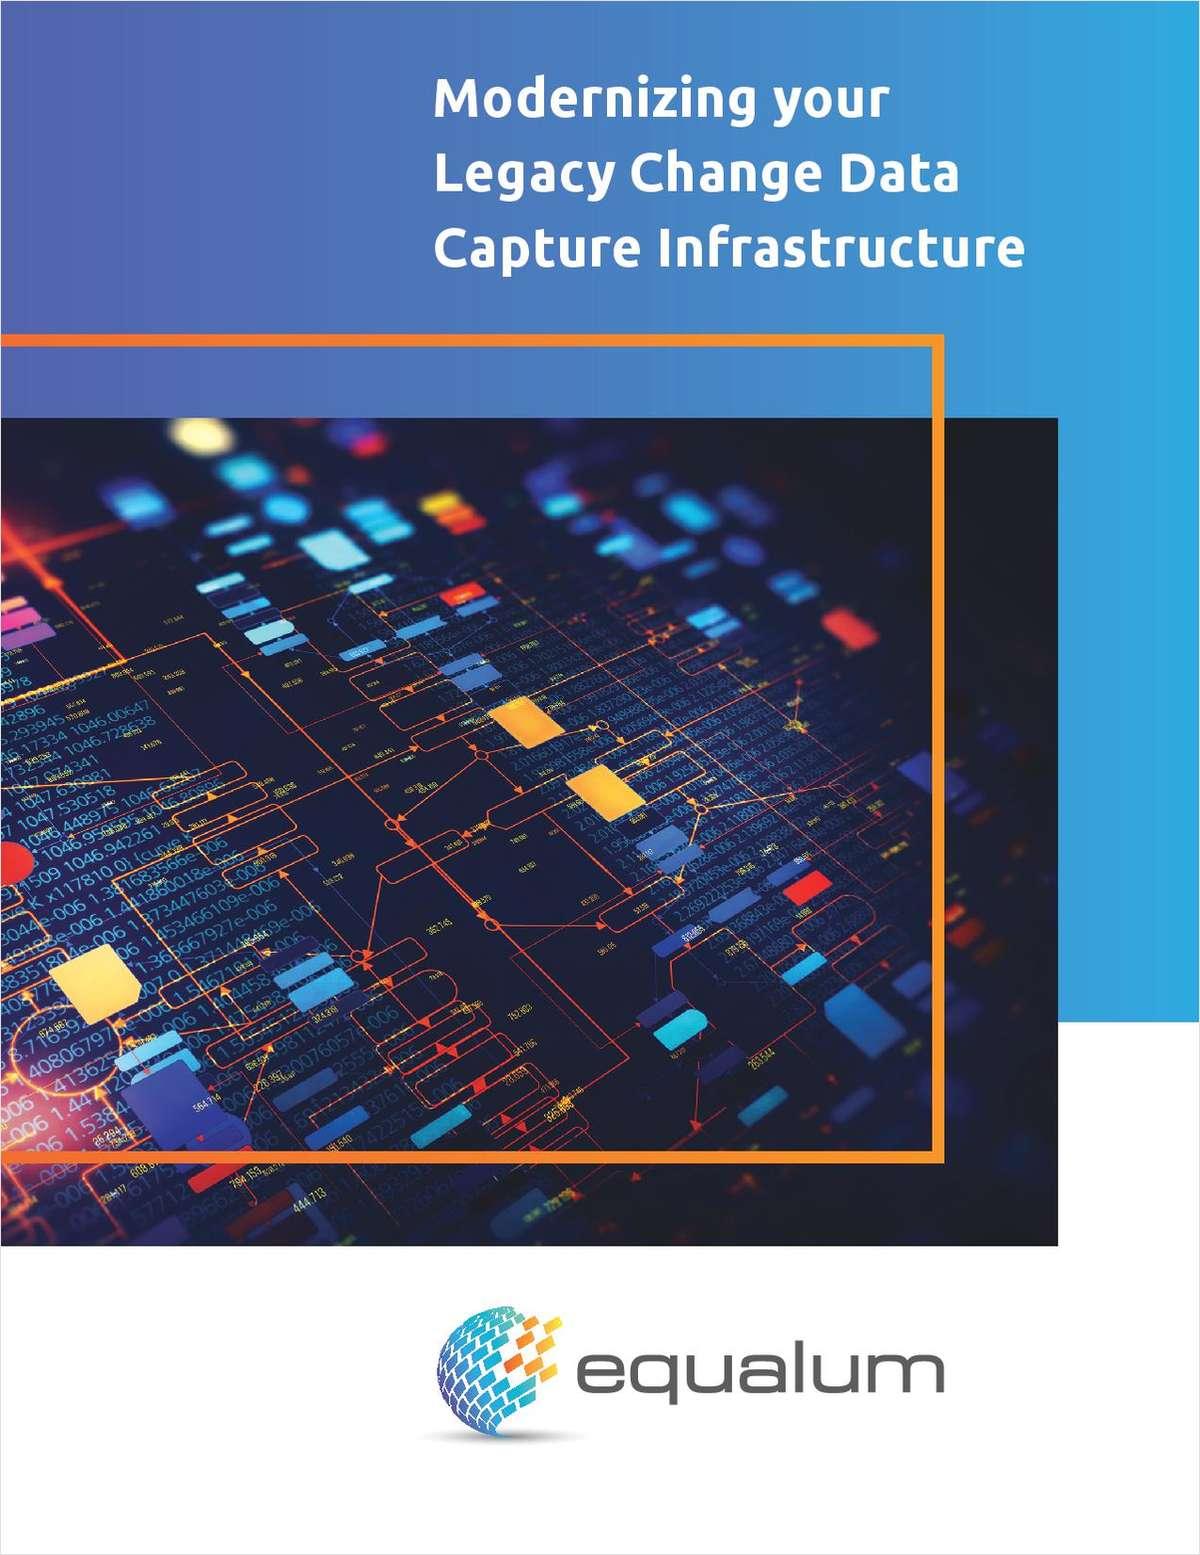 Modernizing your Legacy Change Data Capture Infrastructure